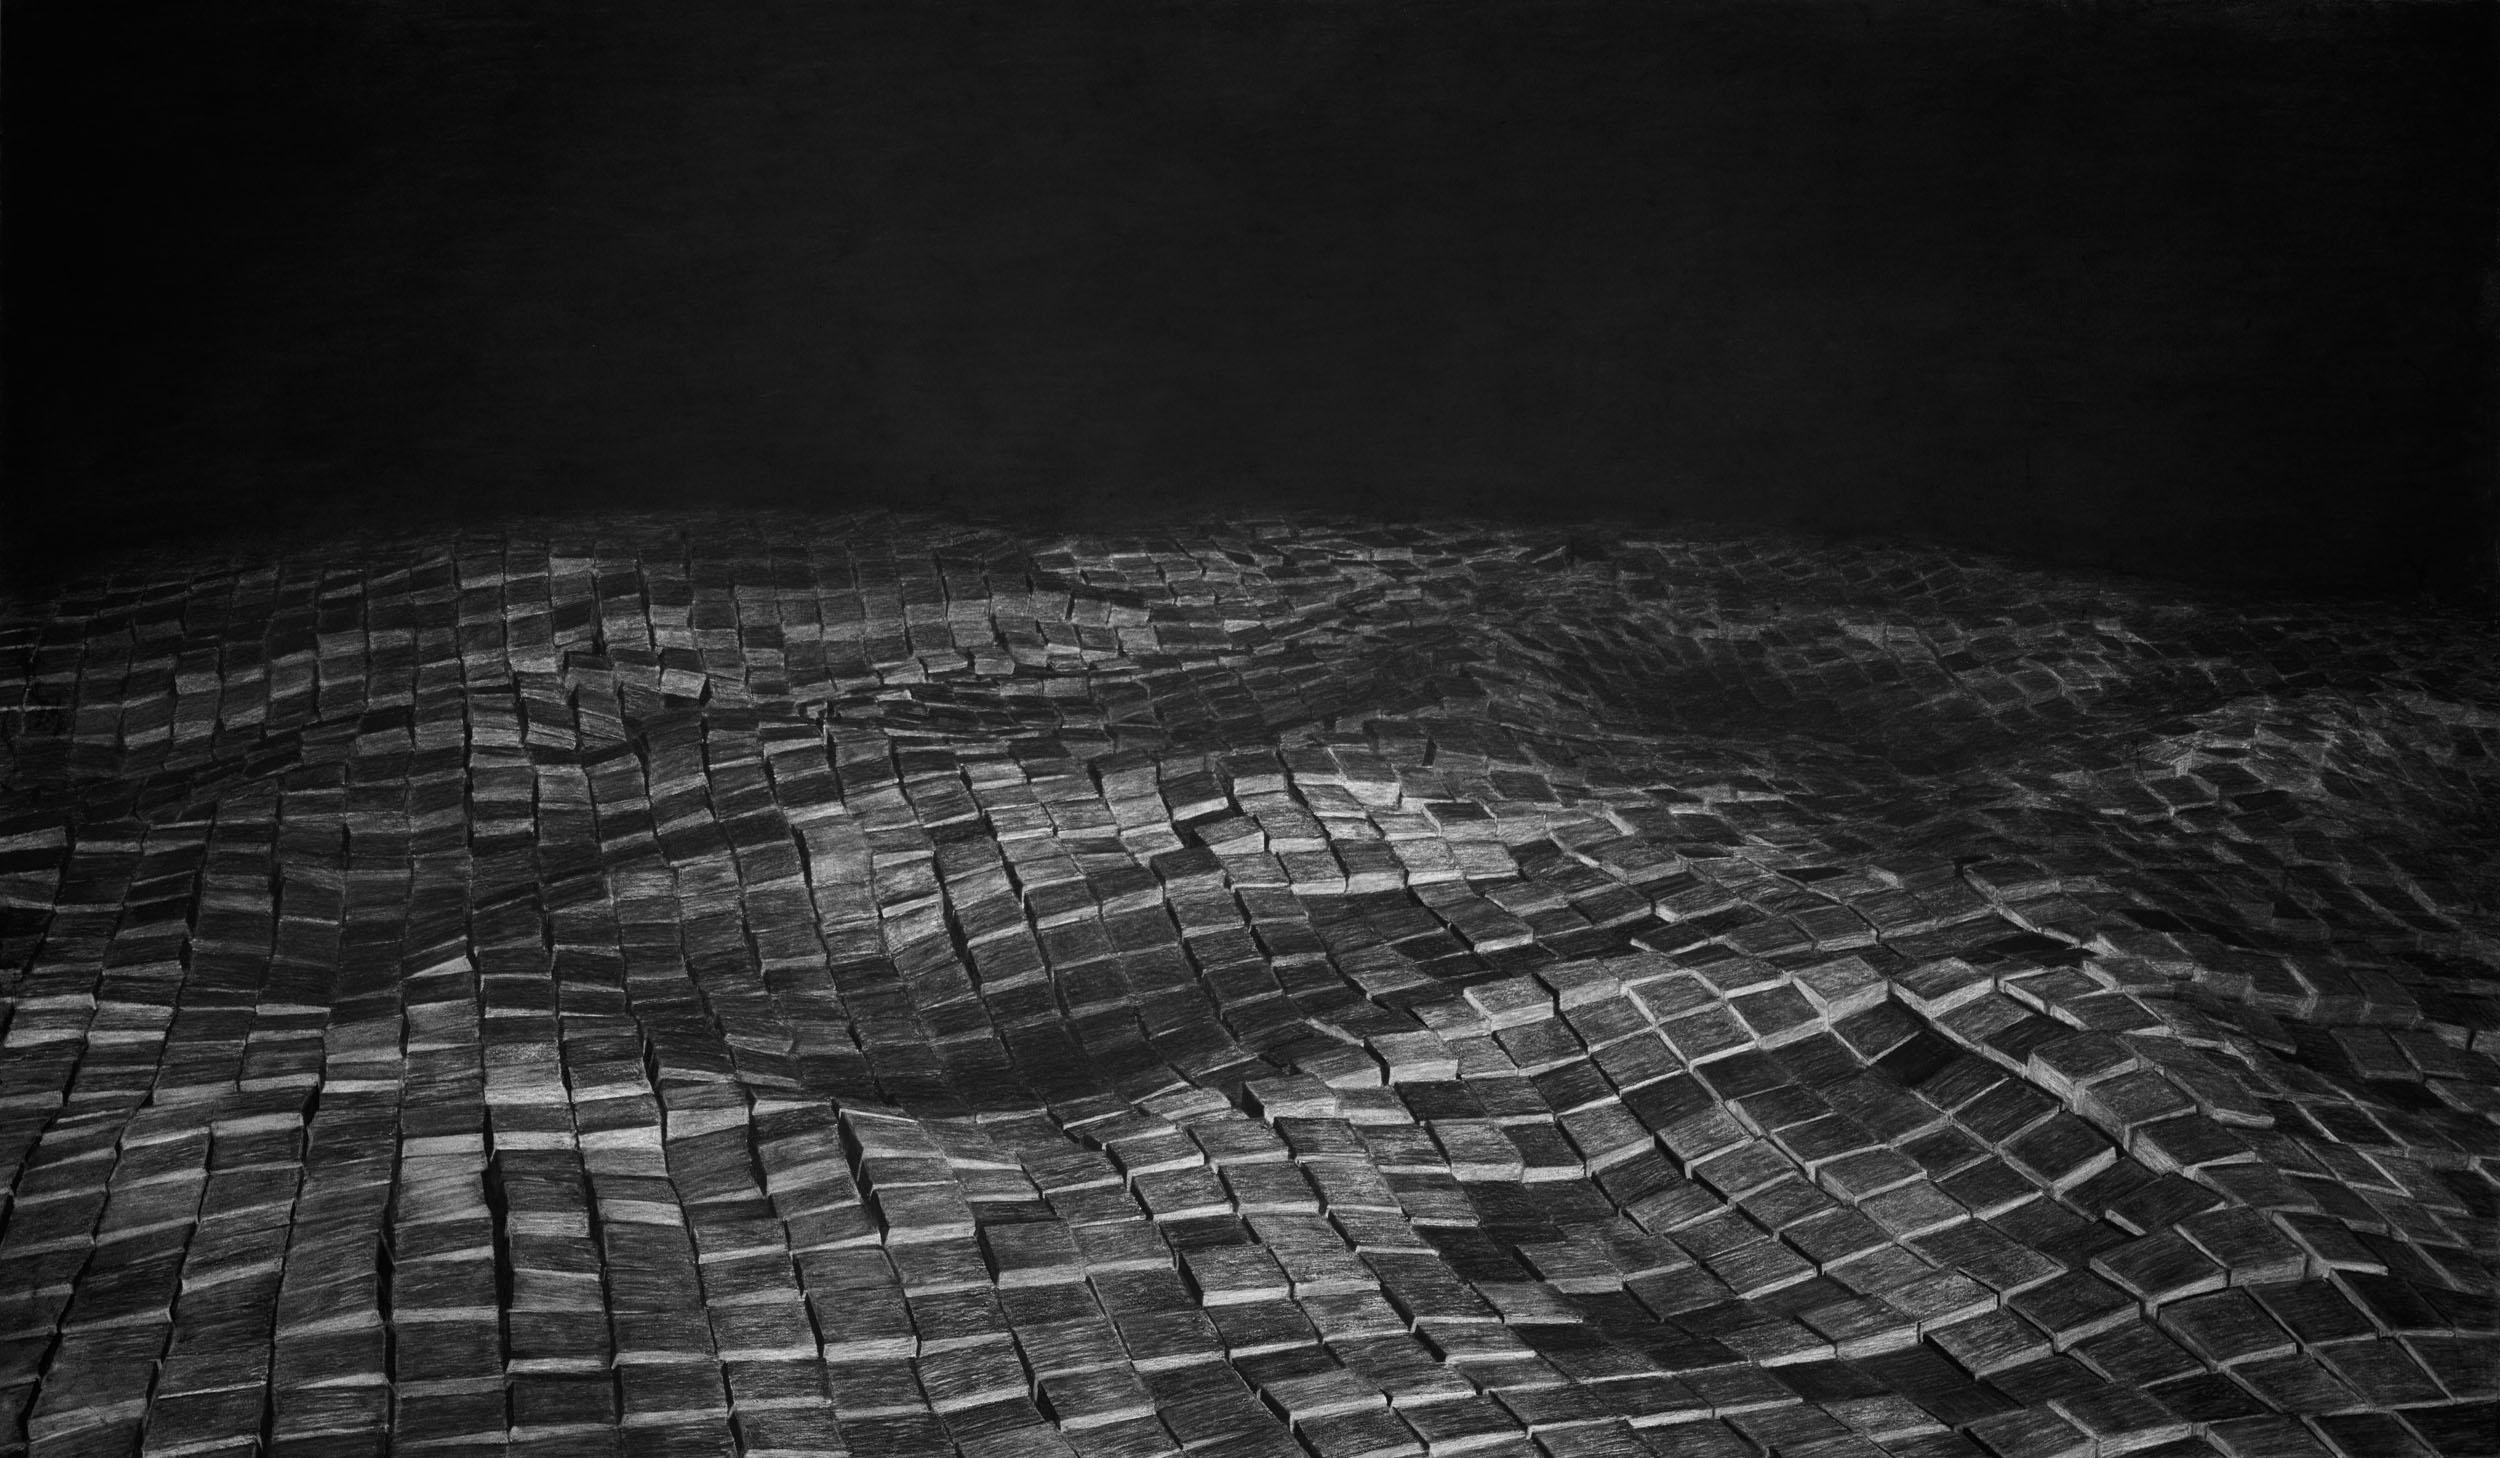 Charcoal drawing | 2016 | 150 x 88 cm